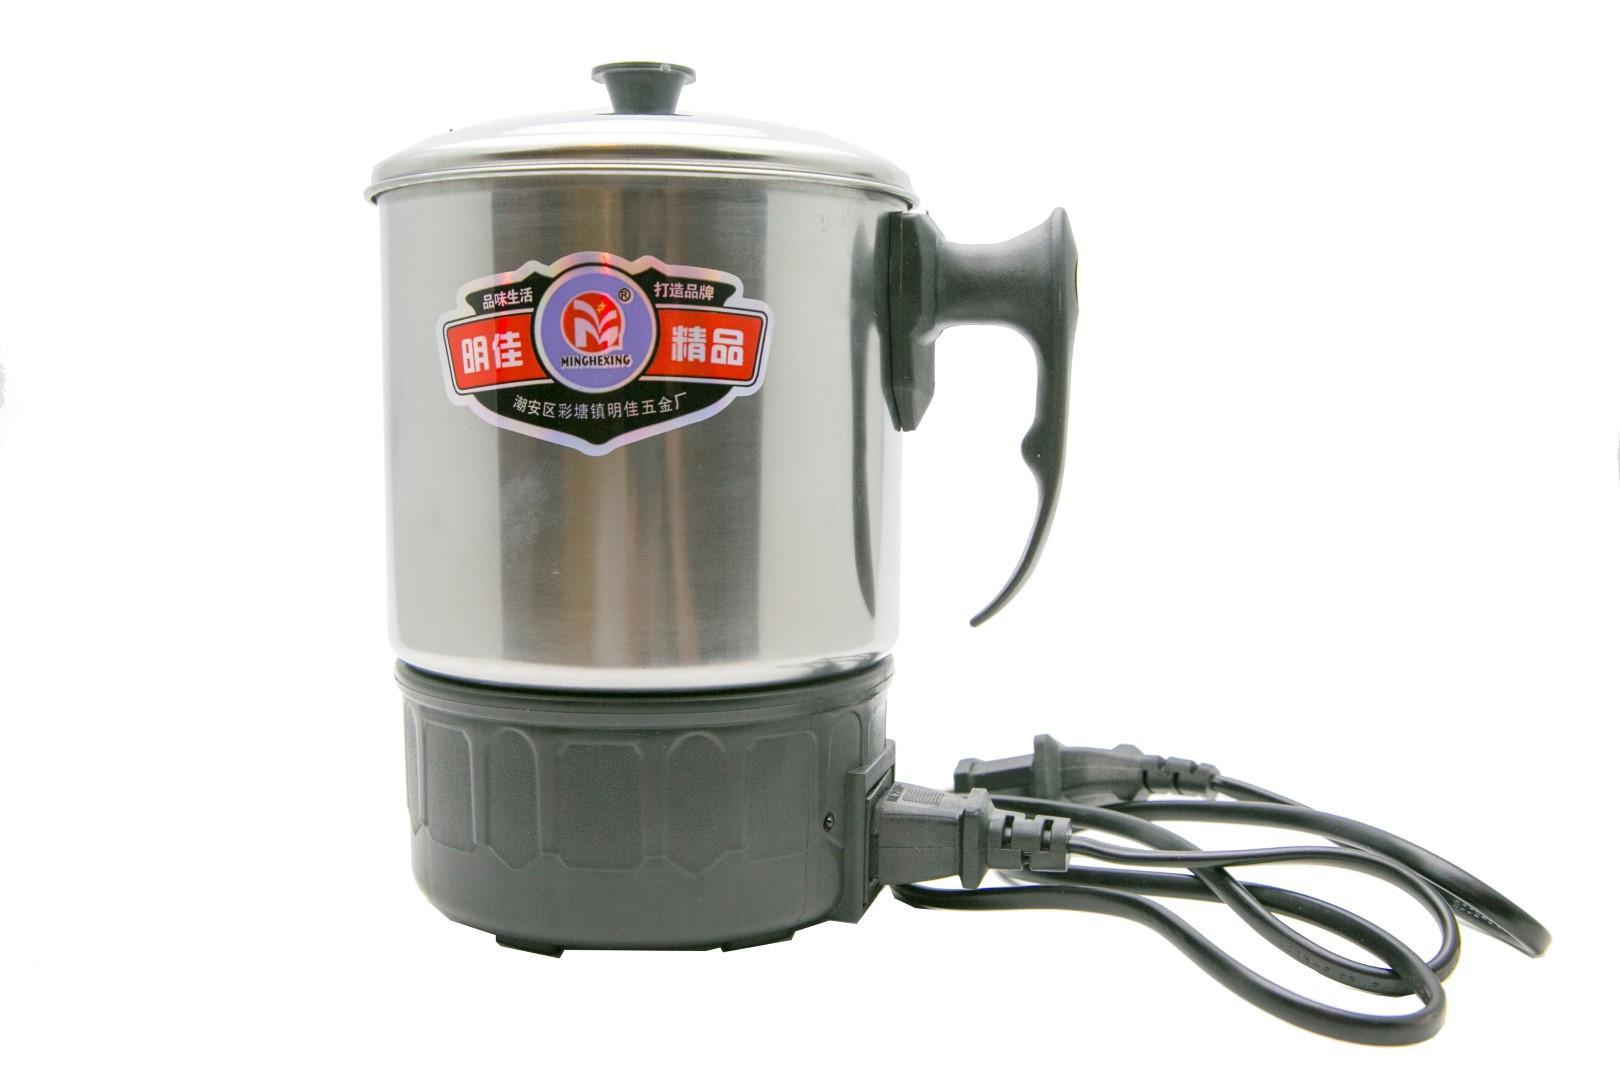 Kelebihan Gelas Masak Pemanas Listrik Stainless Turbo 300 W 13 Cm Electric Heating Cup Q2 11cm Teko Mug 14 Gpl14